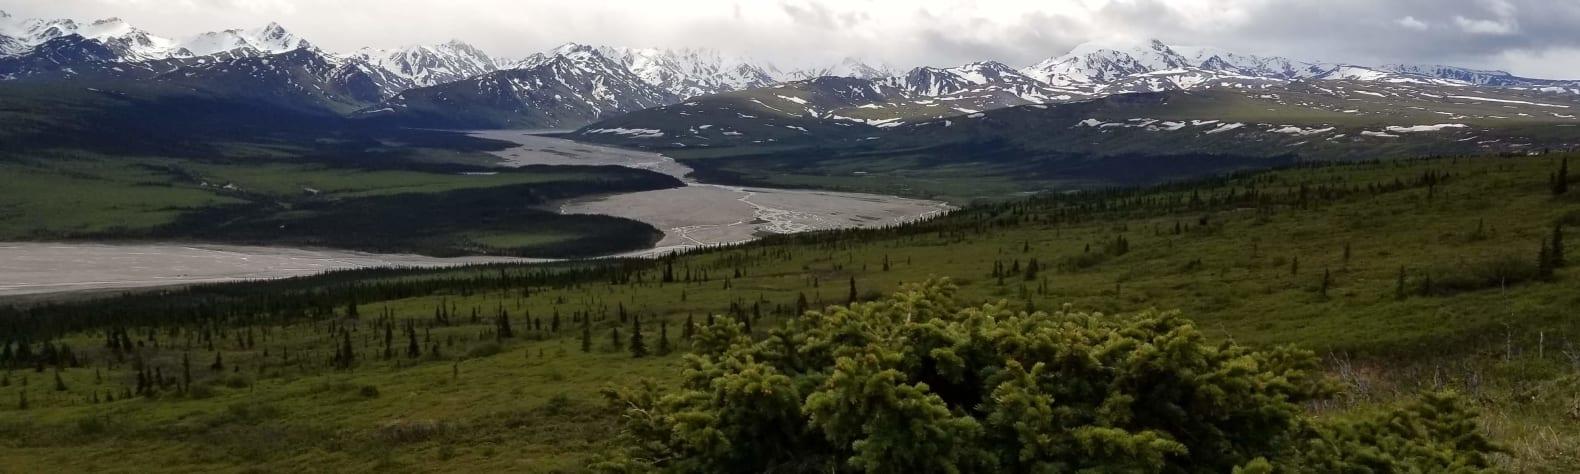 The Alaskan Experience